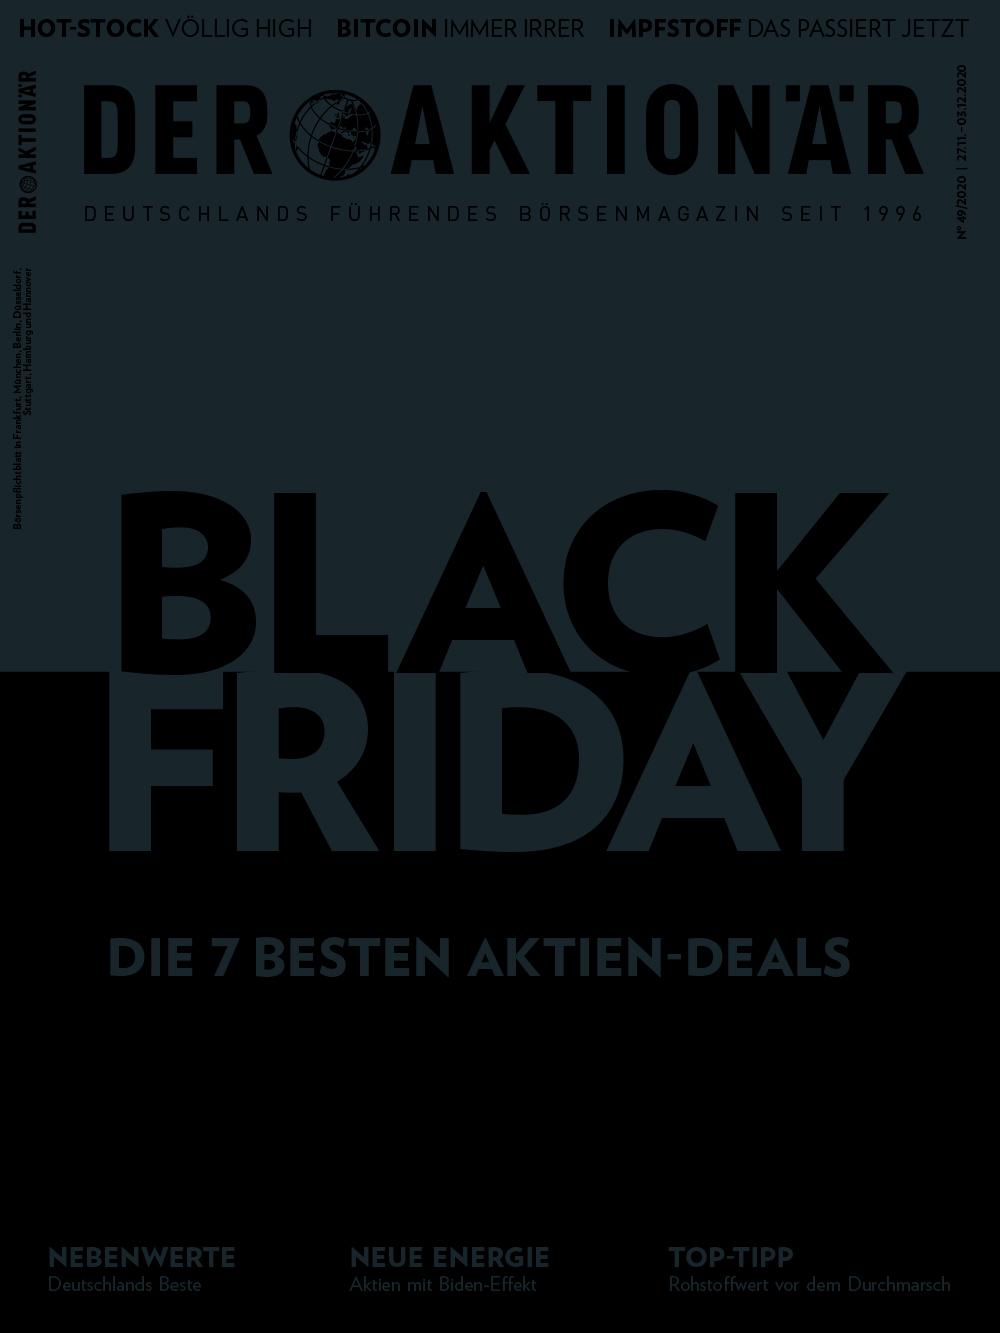 DER AKTIONÄR November/Dezember 2020: Black Friday – Die 7 besten Aktien-Deals